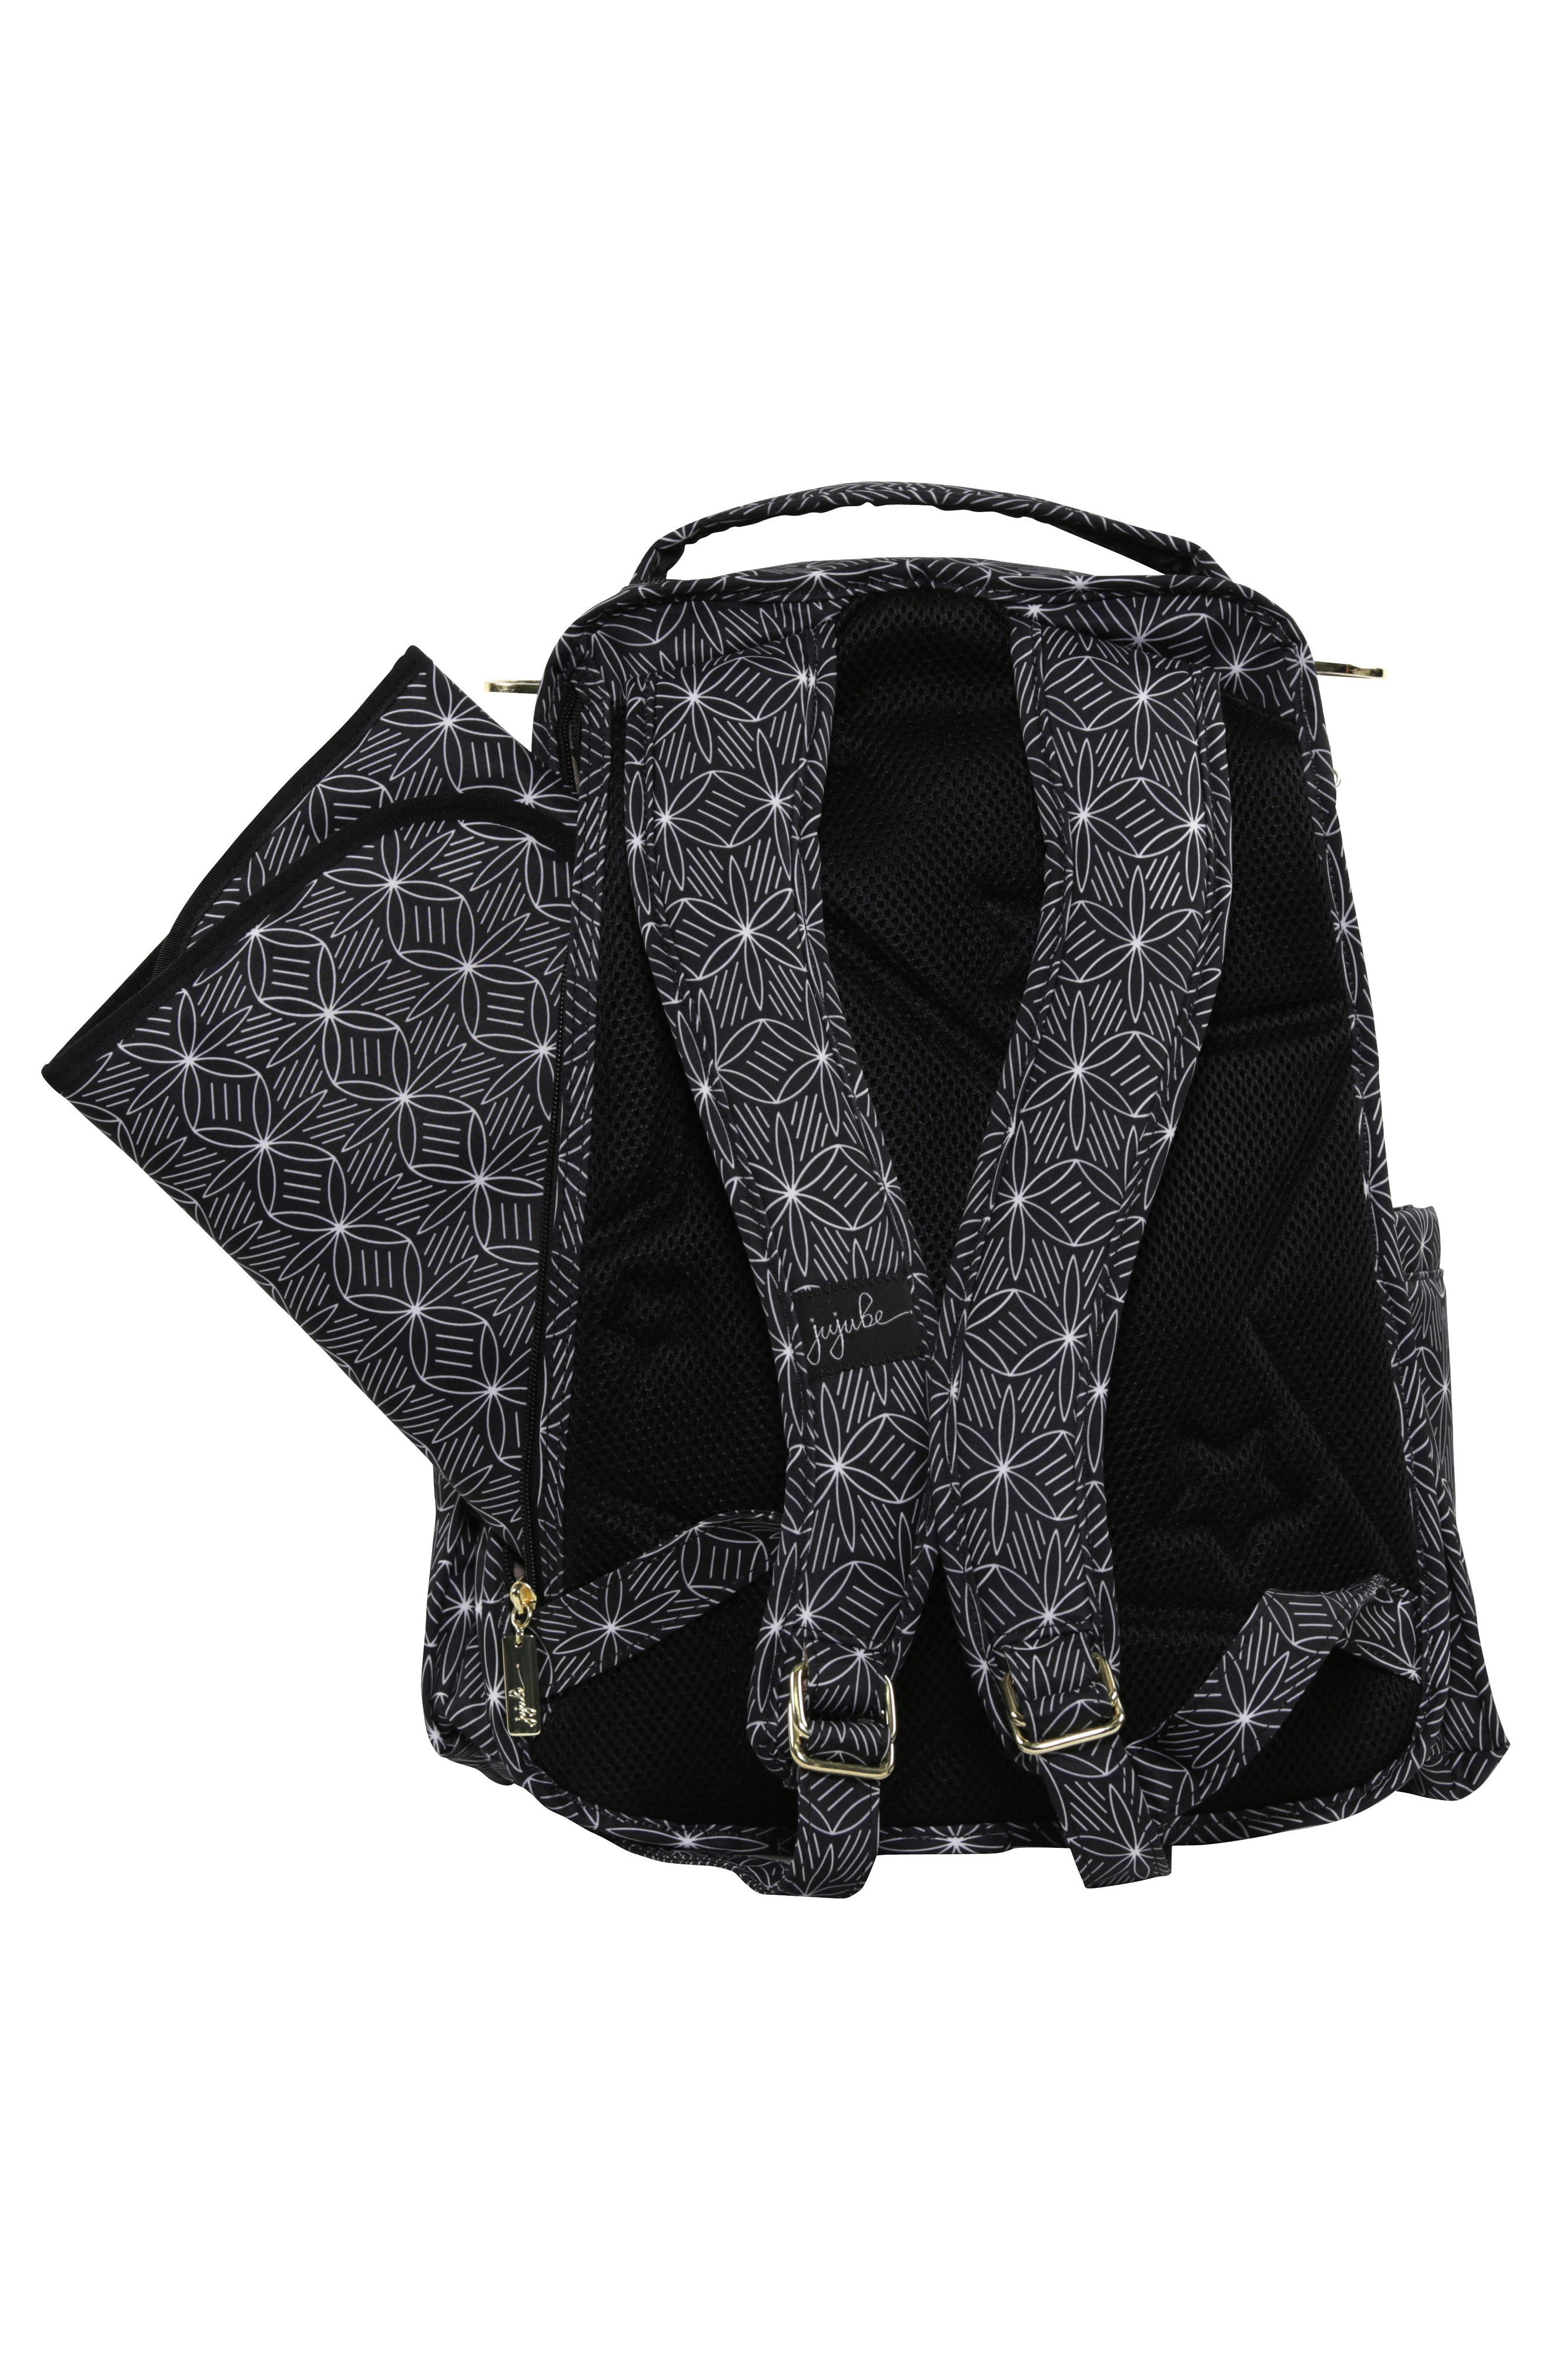 Alternate Image 2  - Ju-Ju-Be 'Legacy - Be Right Back' Diaper Backpack